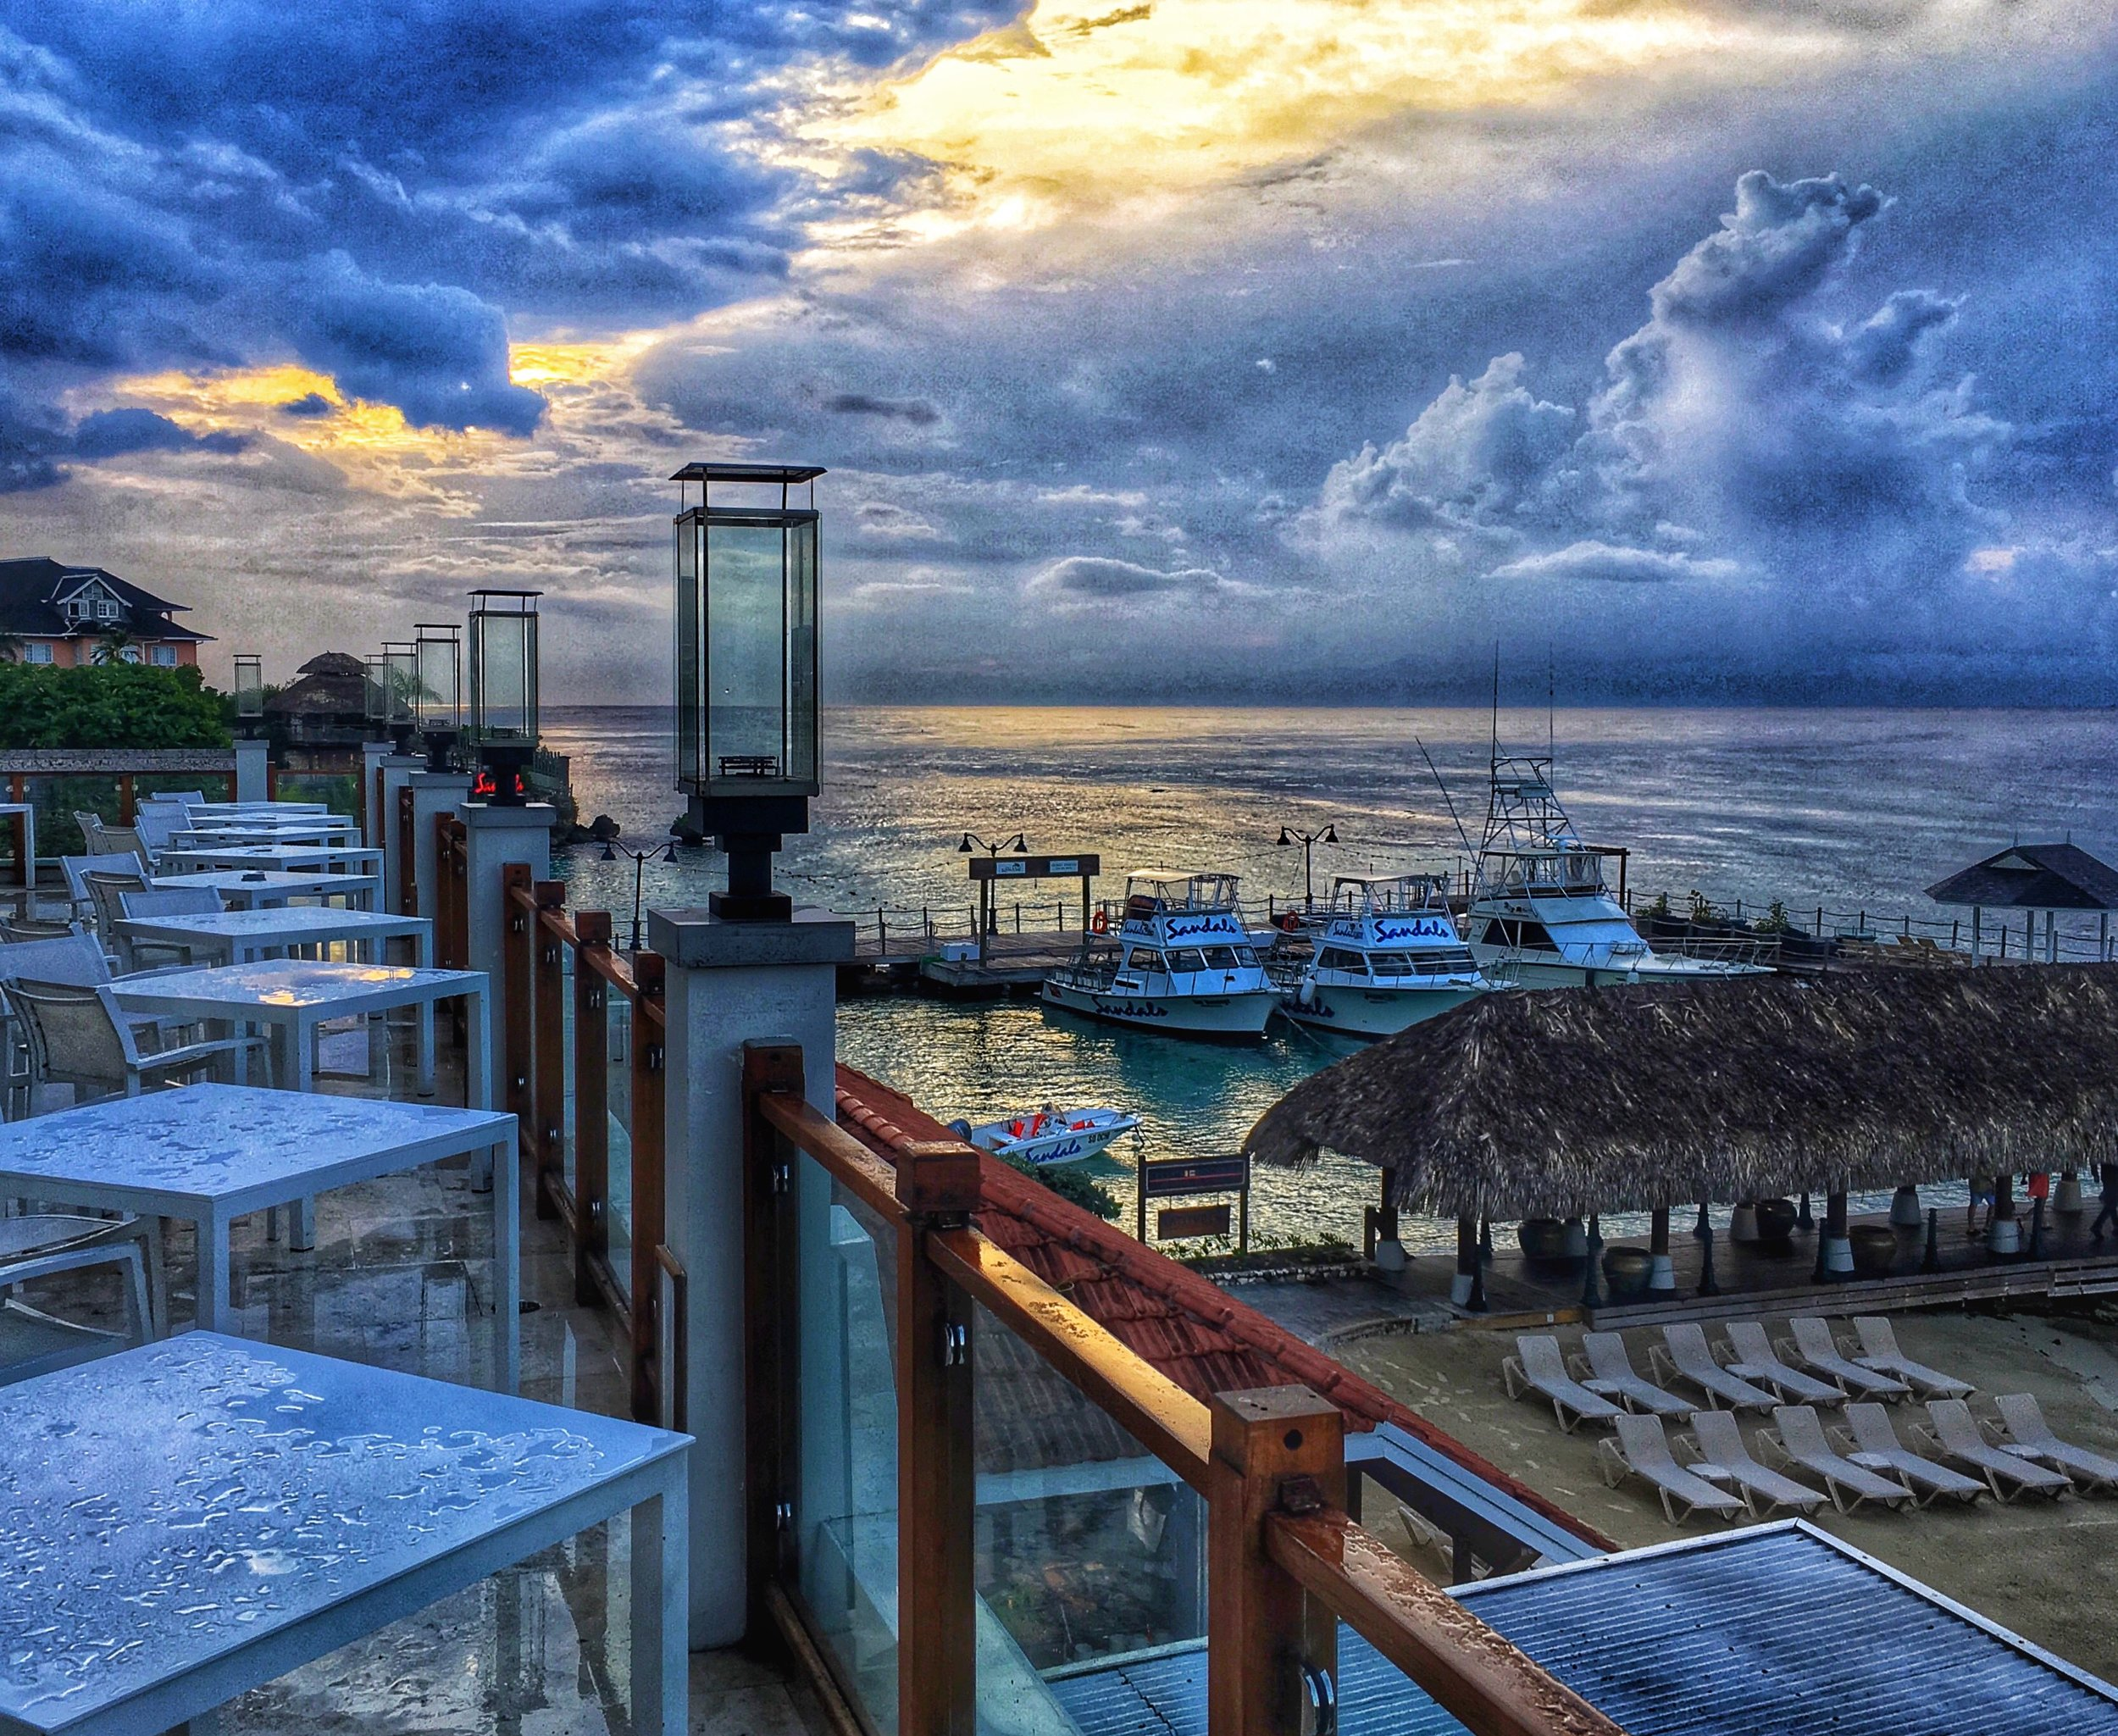 Jamaica_sea and sky.jpeg